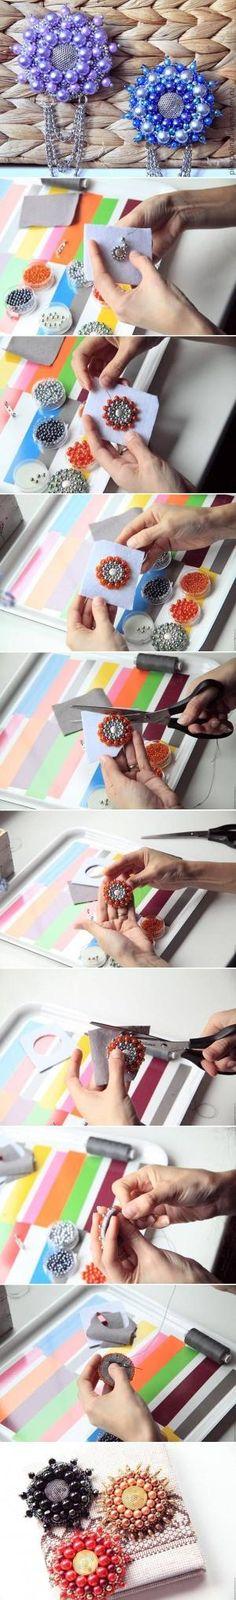 DIY бисер цветок брошь, желая